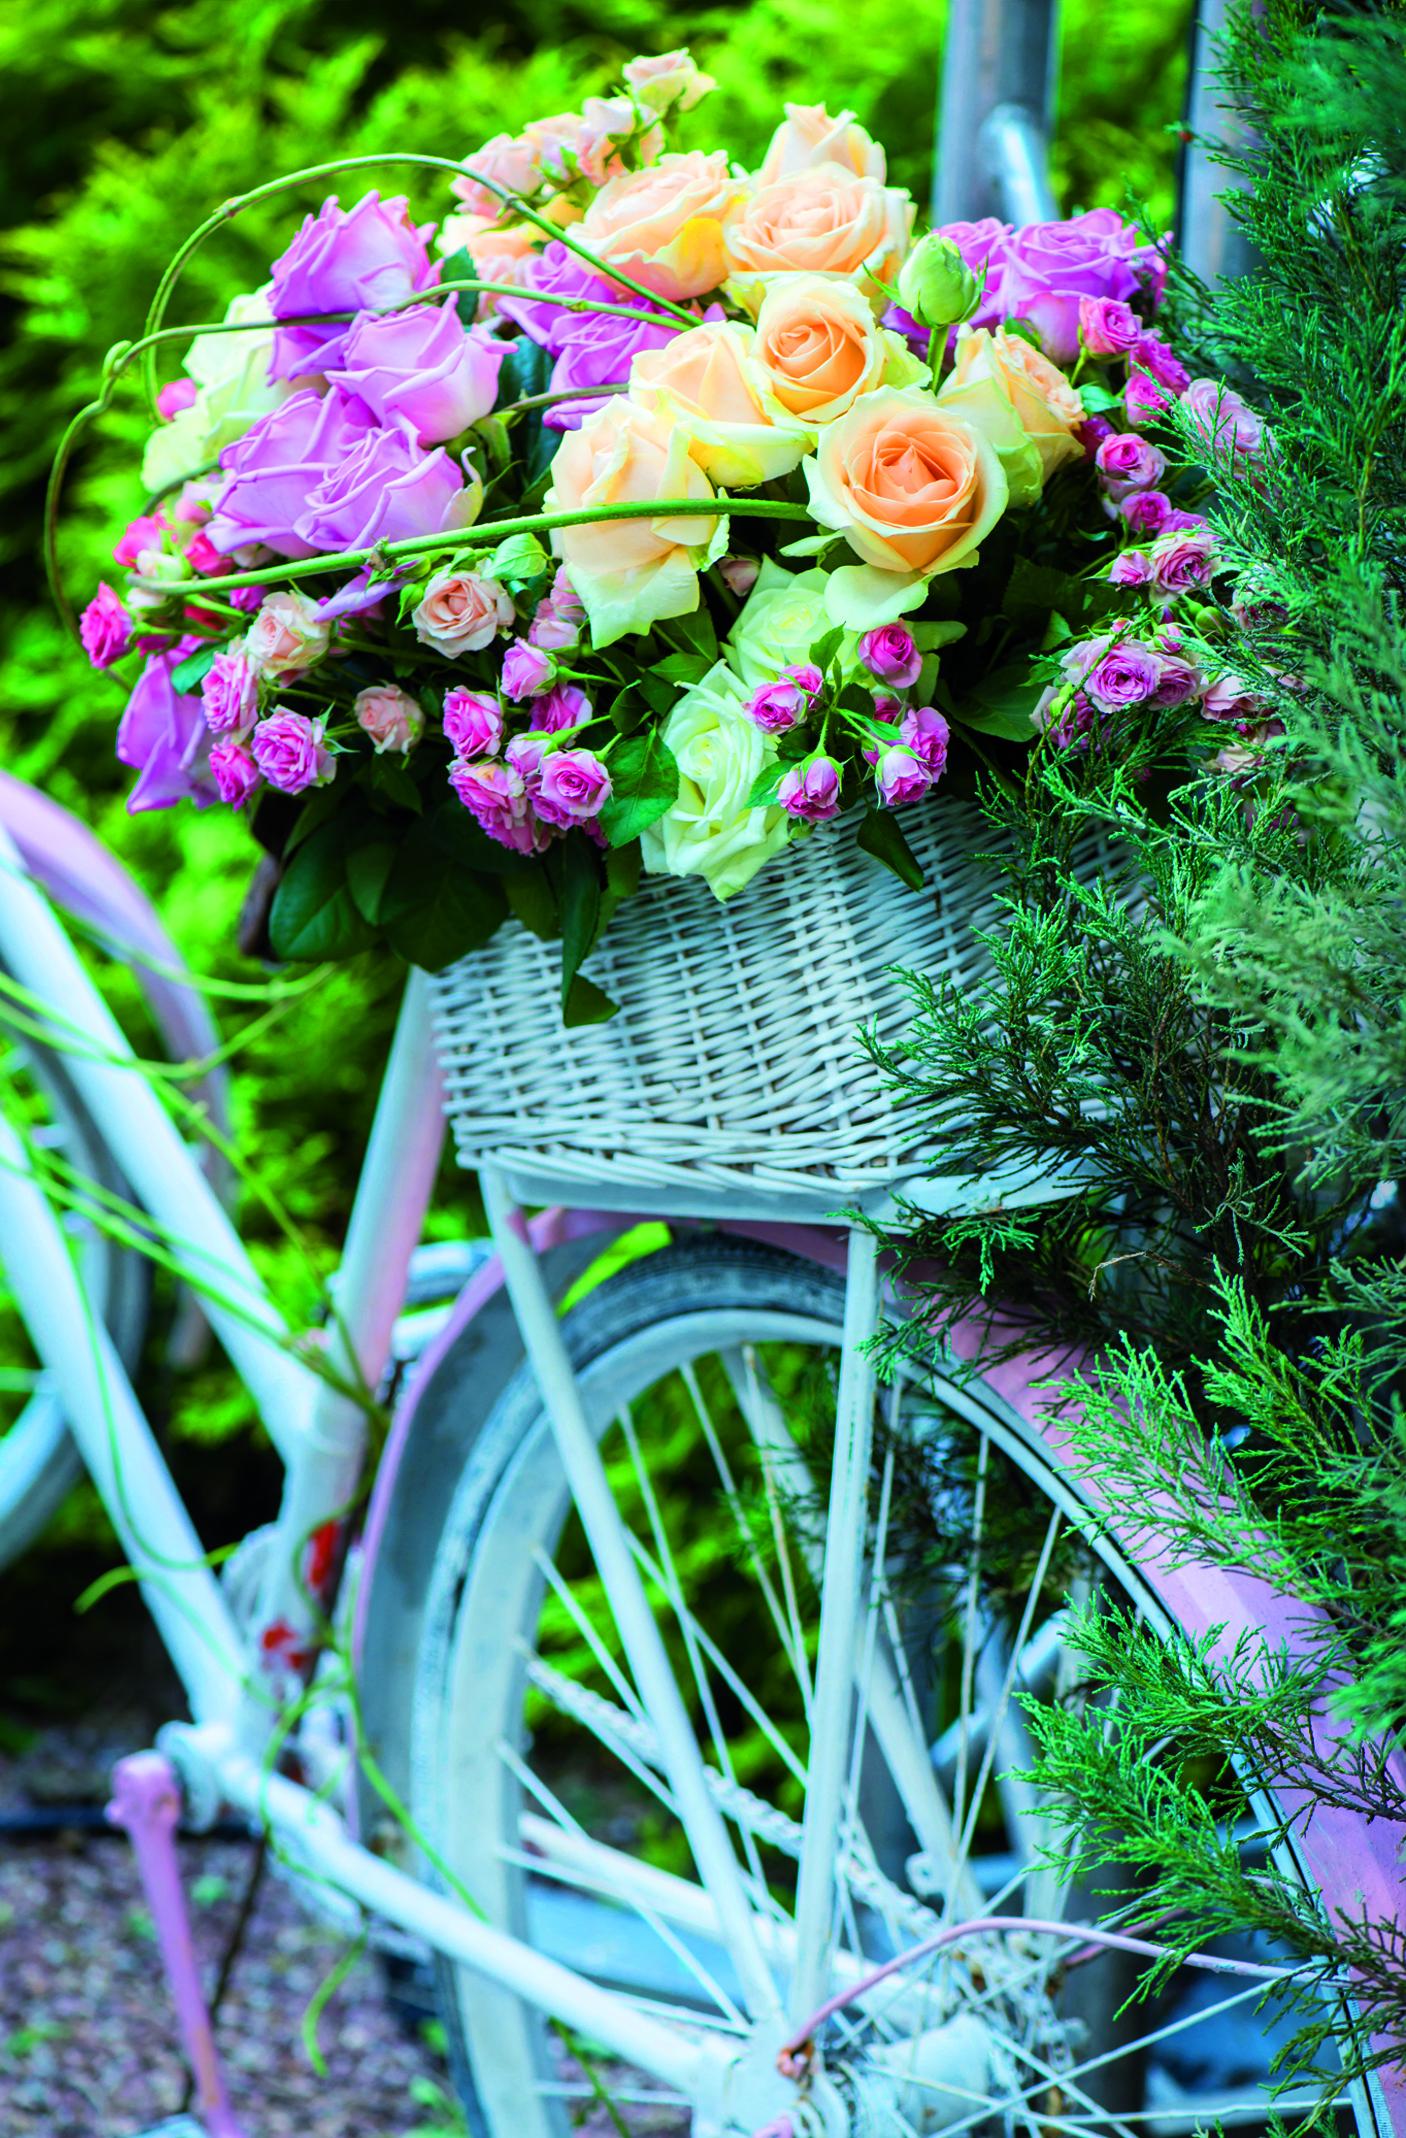 Fahrrad m. Blumenkorb